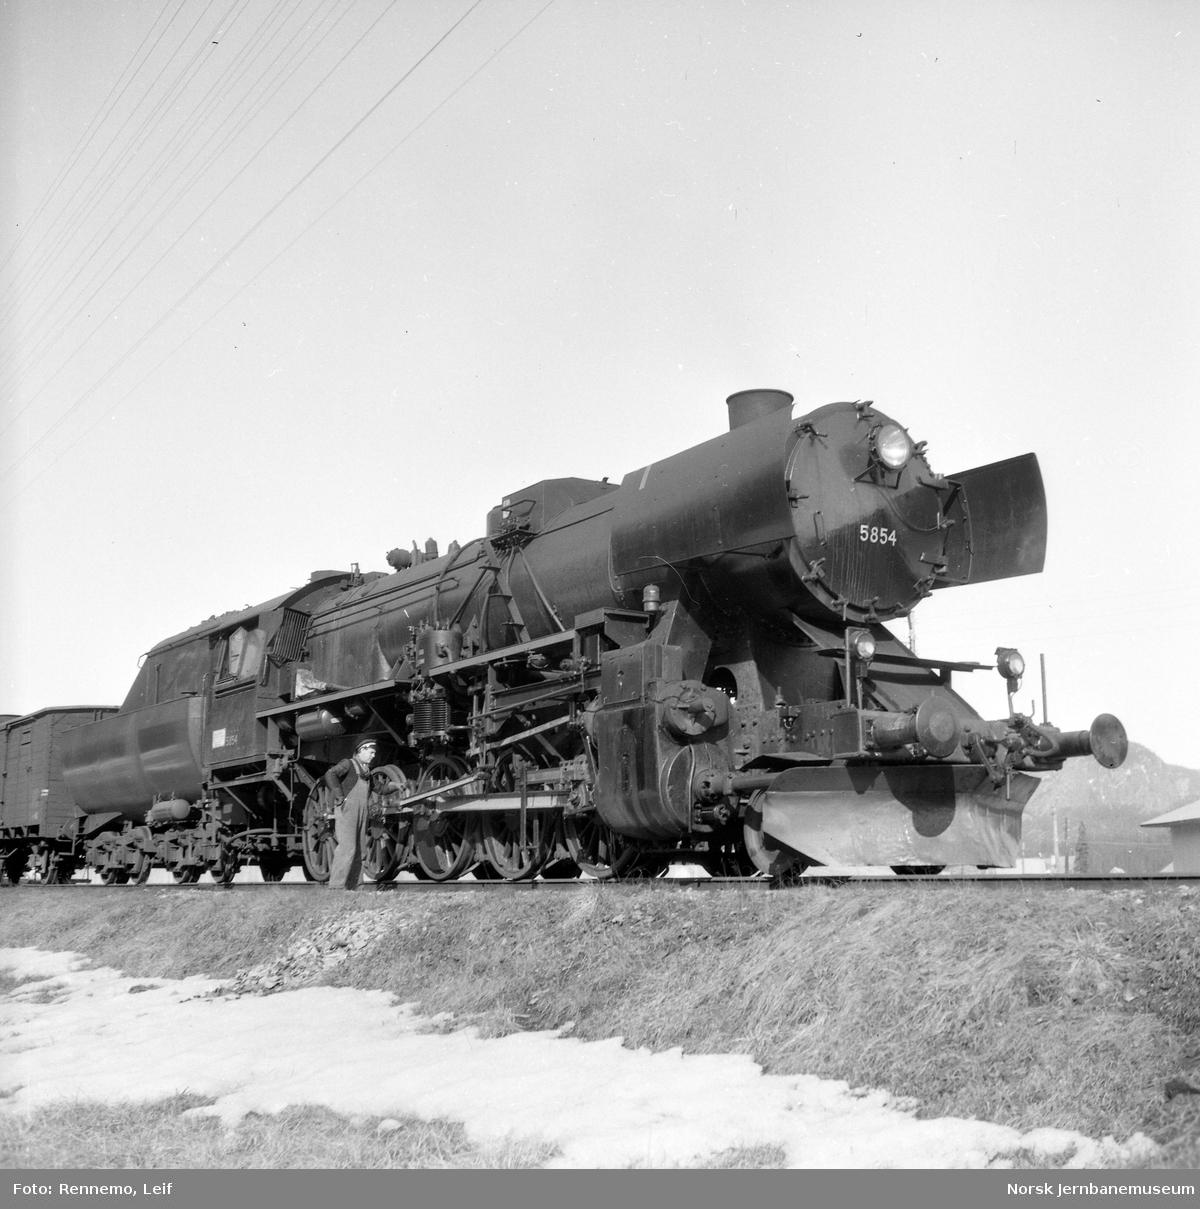 Damplokomotiv type 63a nr. 5854